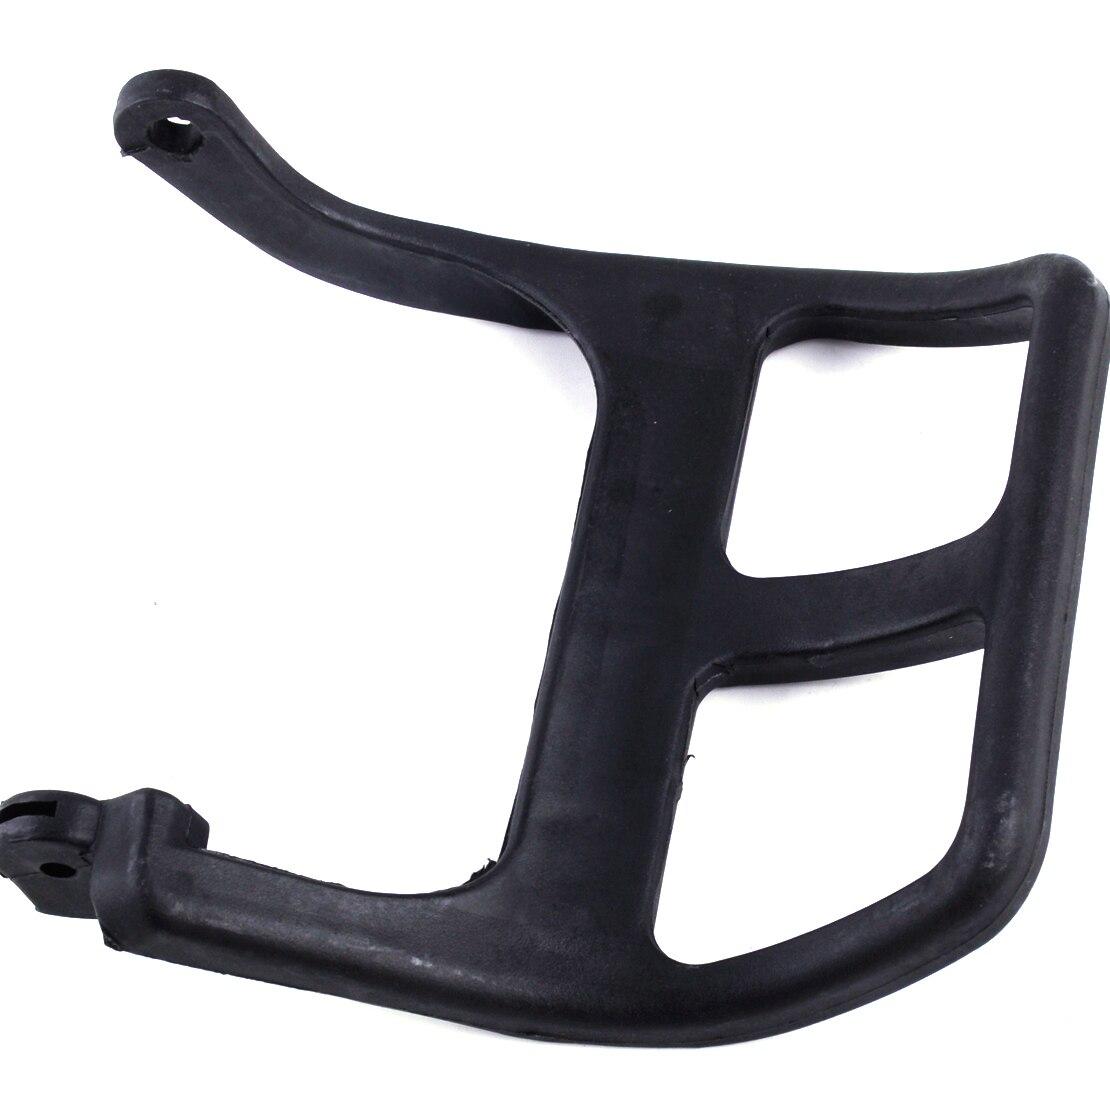 LOVIVER Durable Chain Brake Handle Hand Guard Fits STIHL MS180 ...